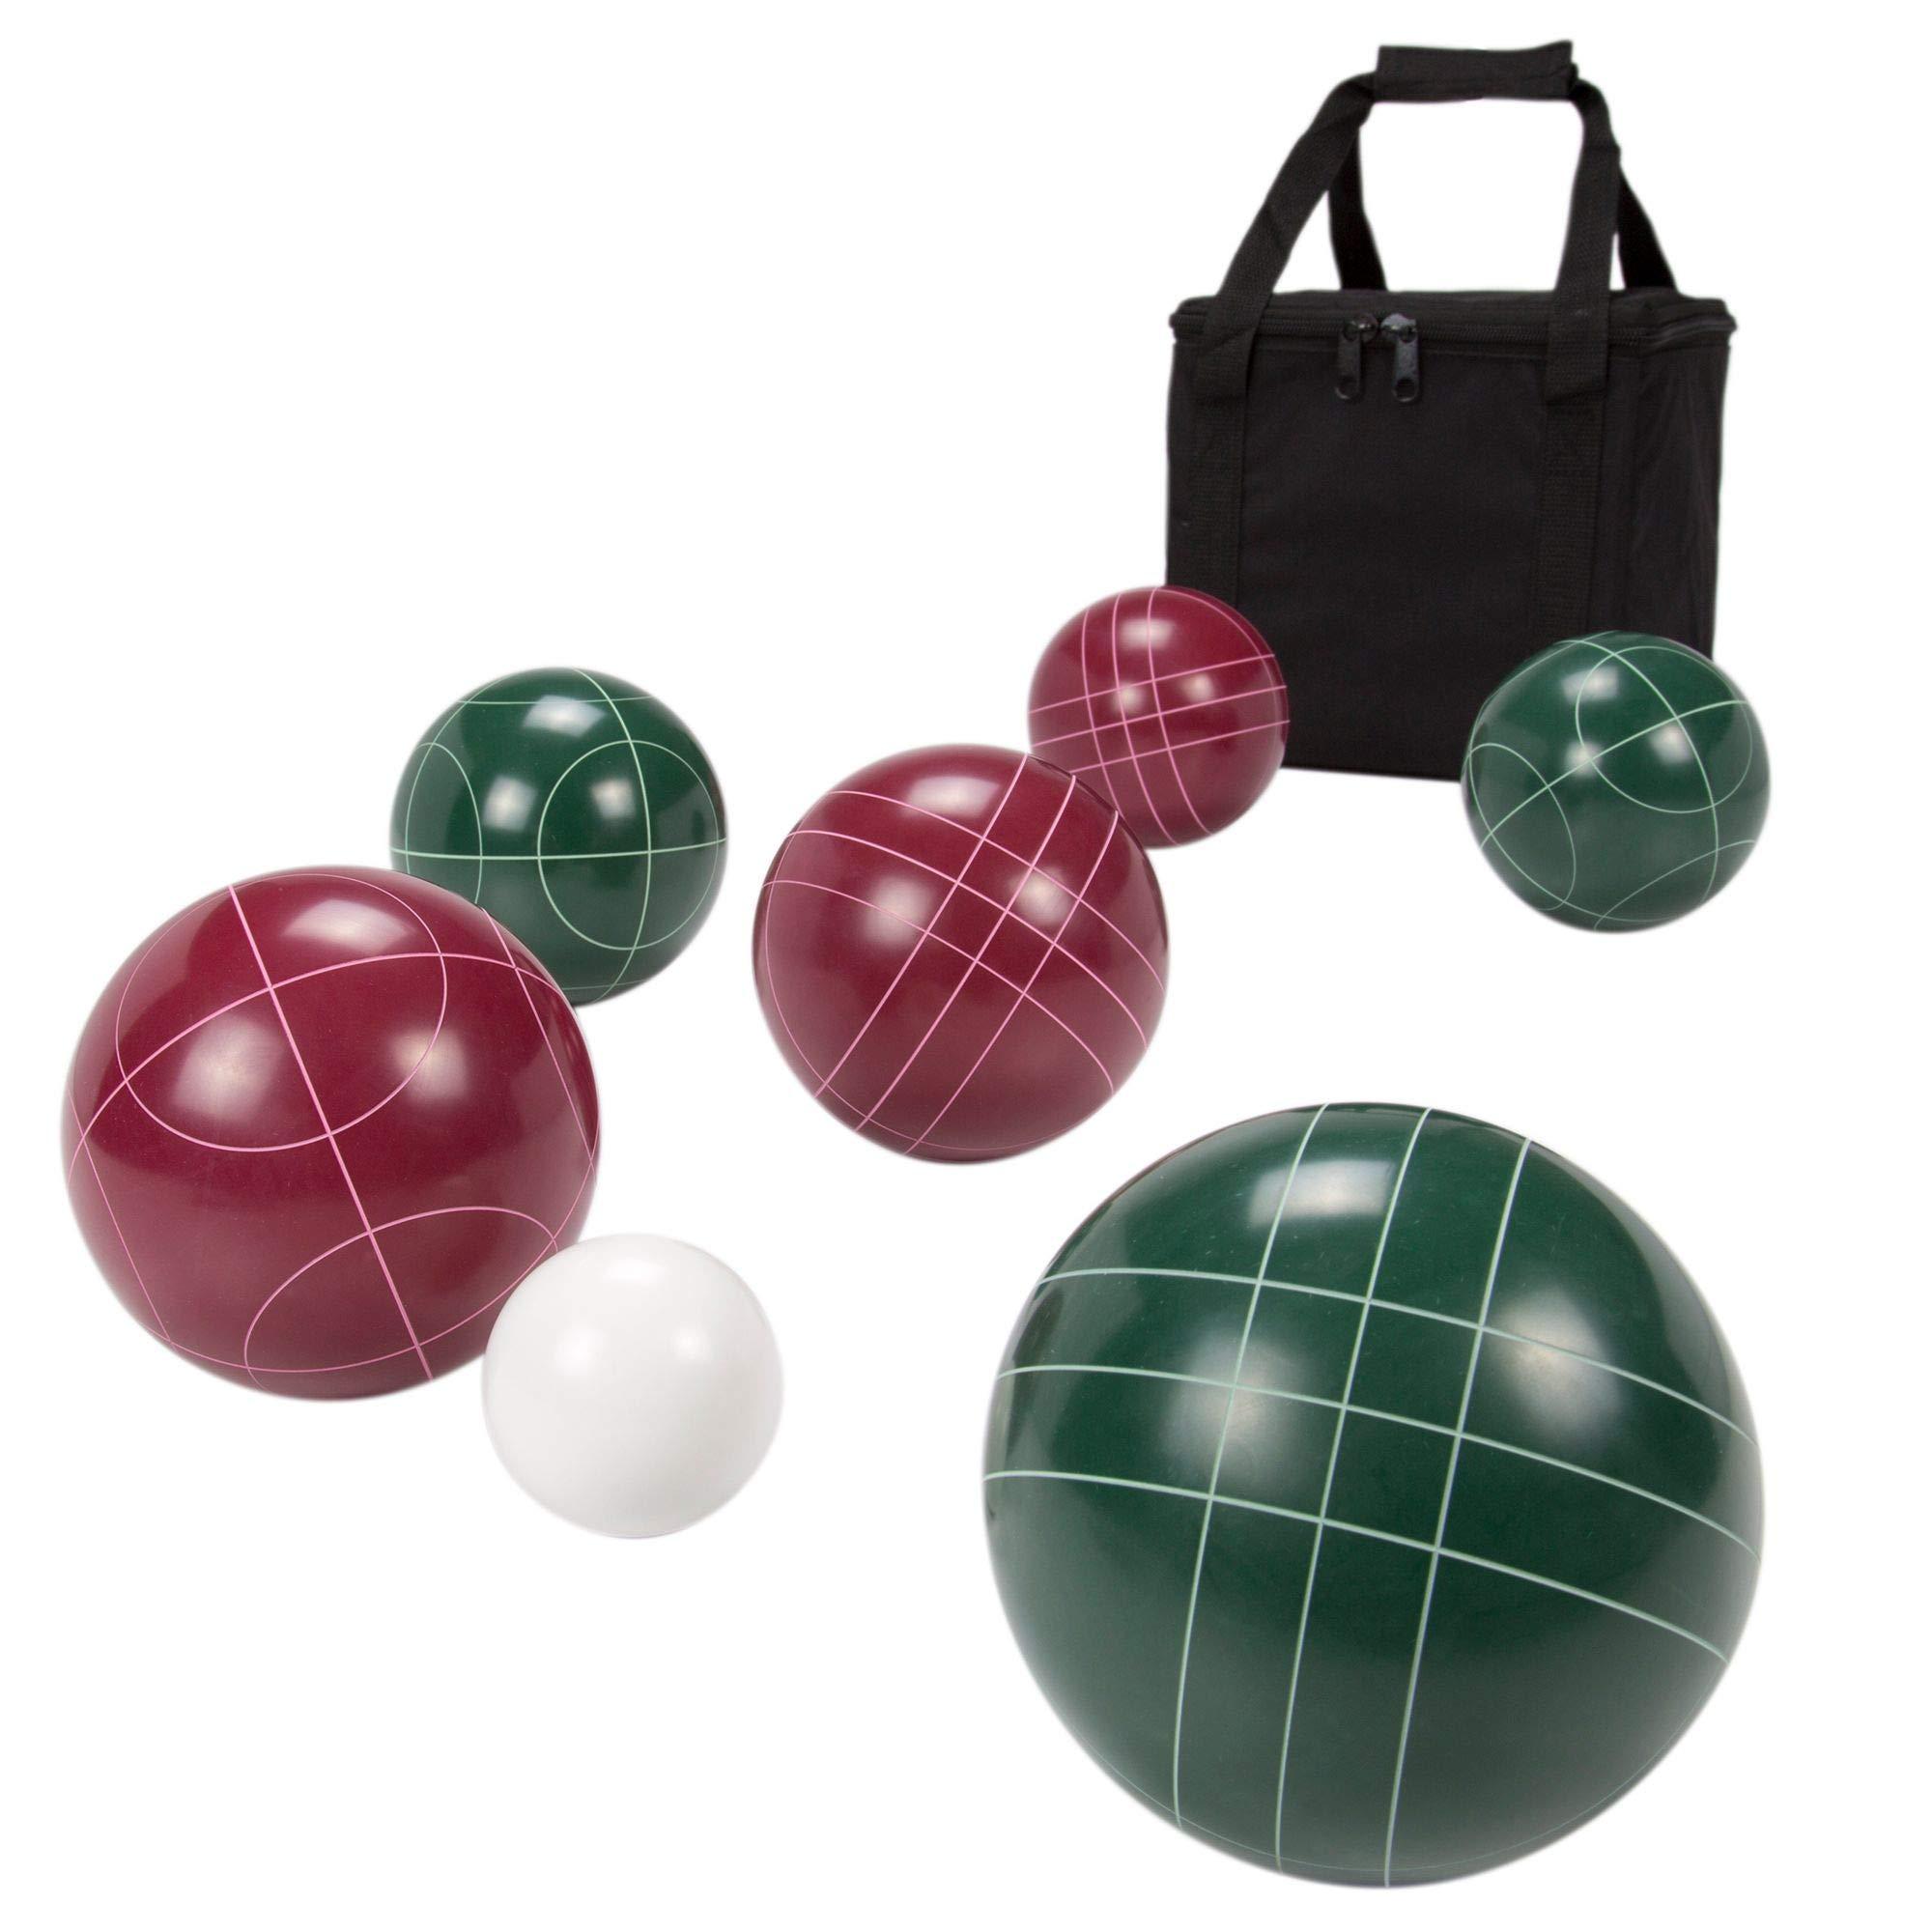 HealthyBells Bocce Ball Set Regulation Size